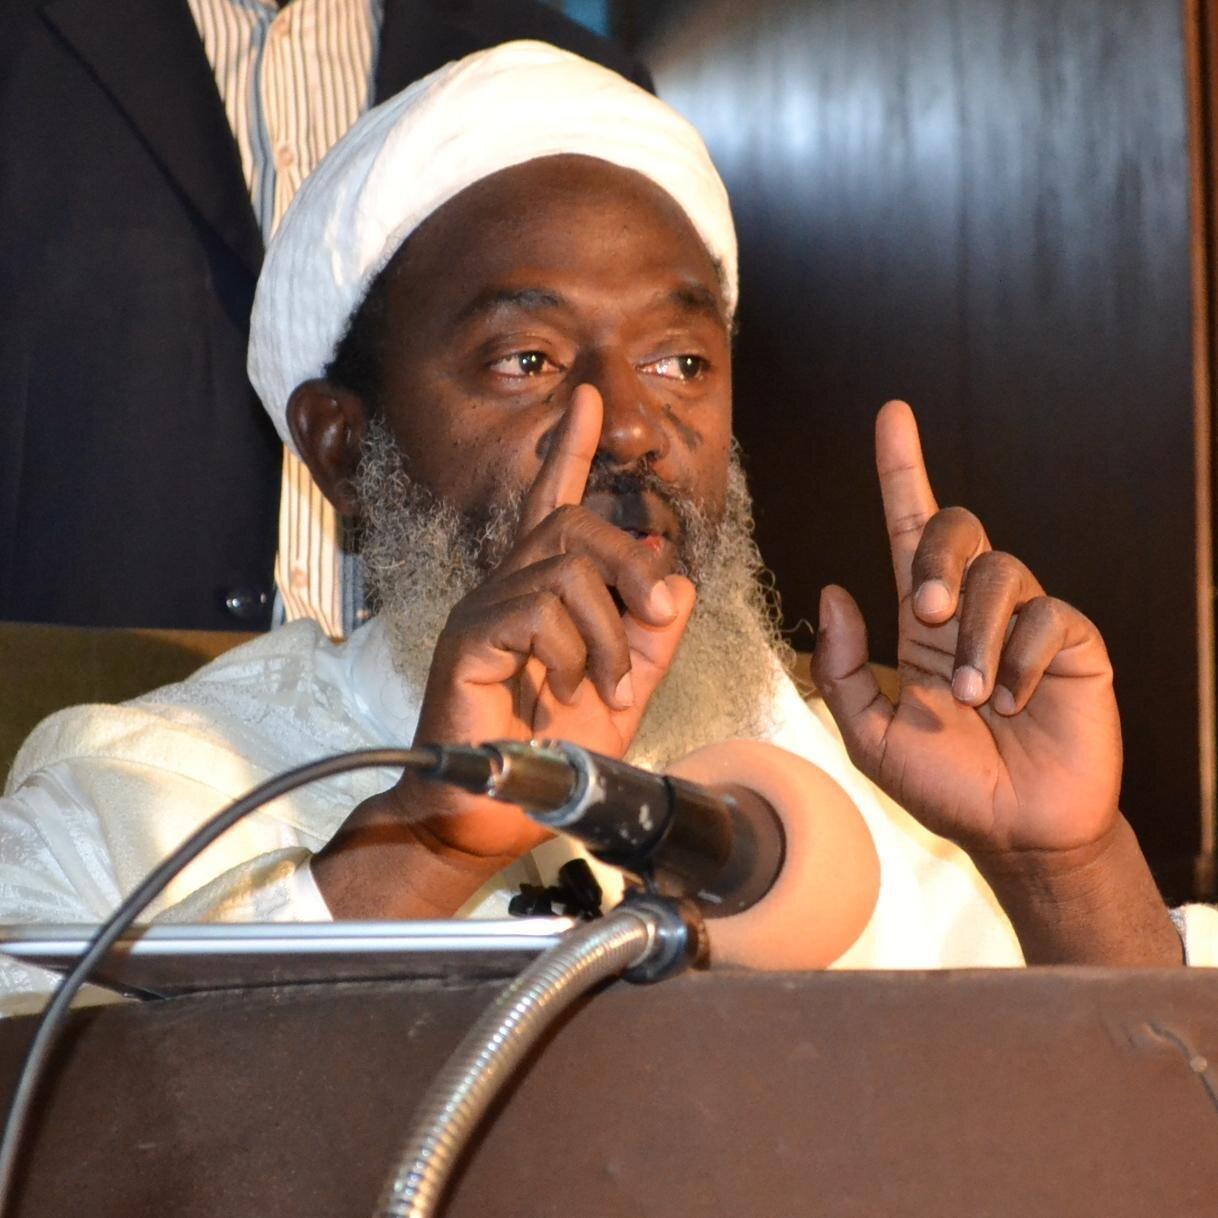 Biafra: Discuss with Nnamdi Kanu's IPOB – Sheikh Gumi tells Buhari